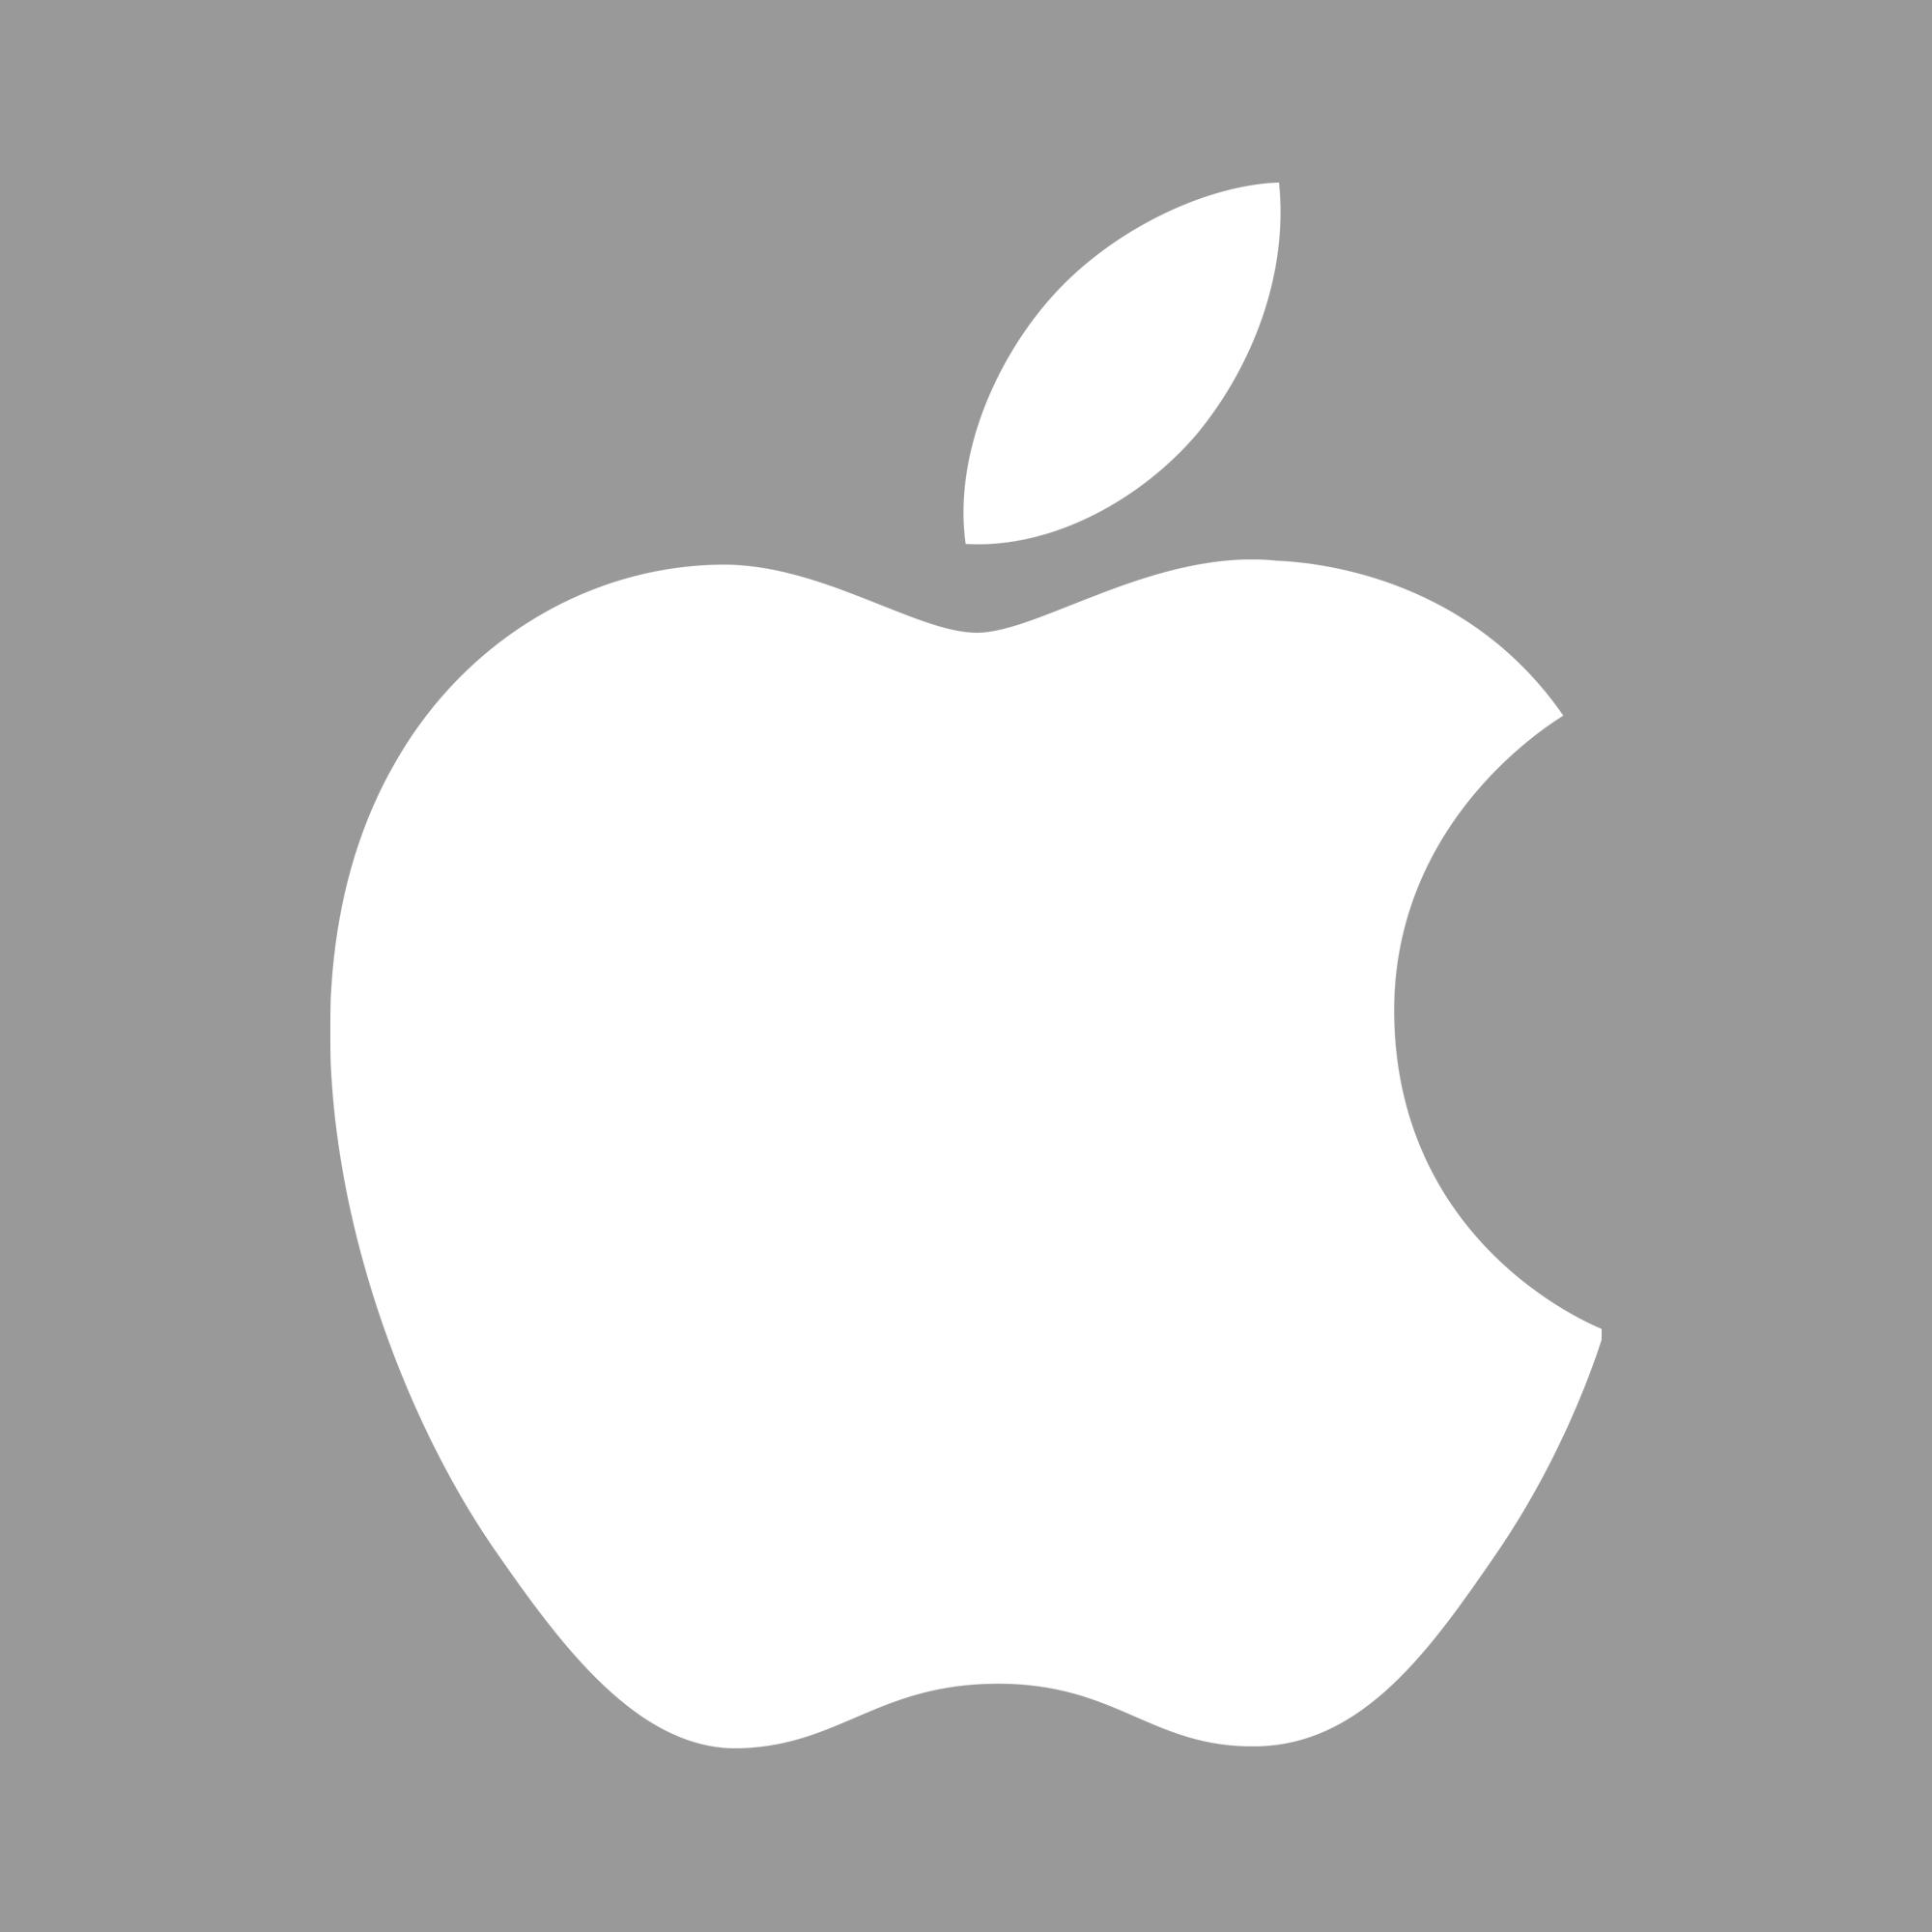 Apple_gray_logo (1)